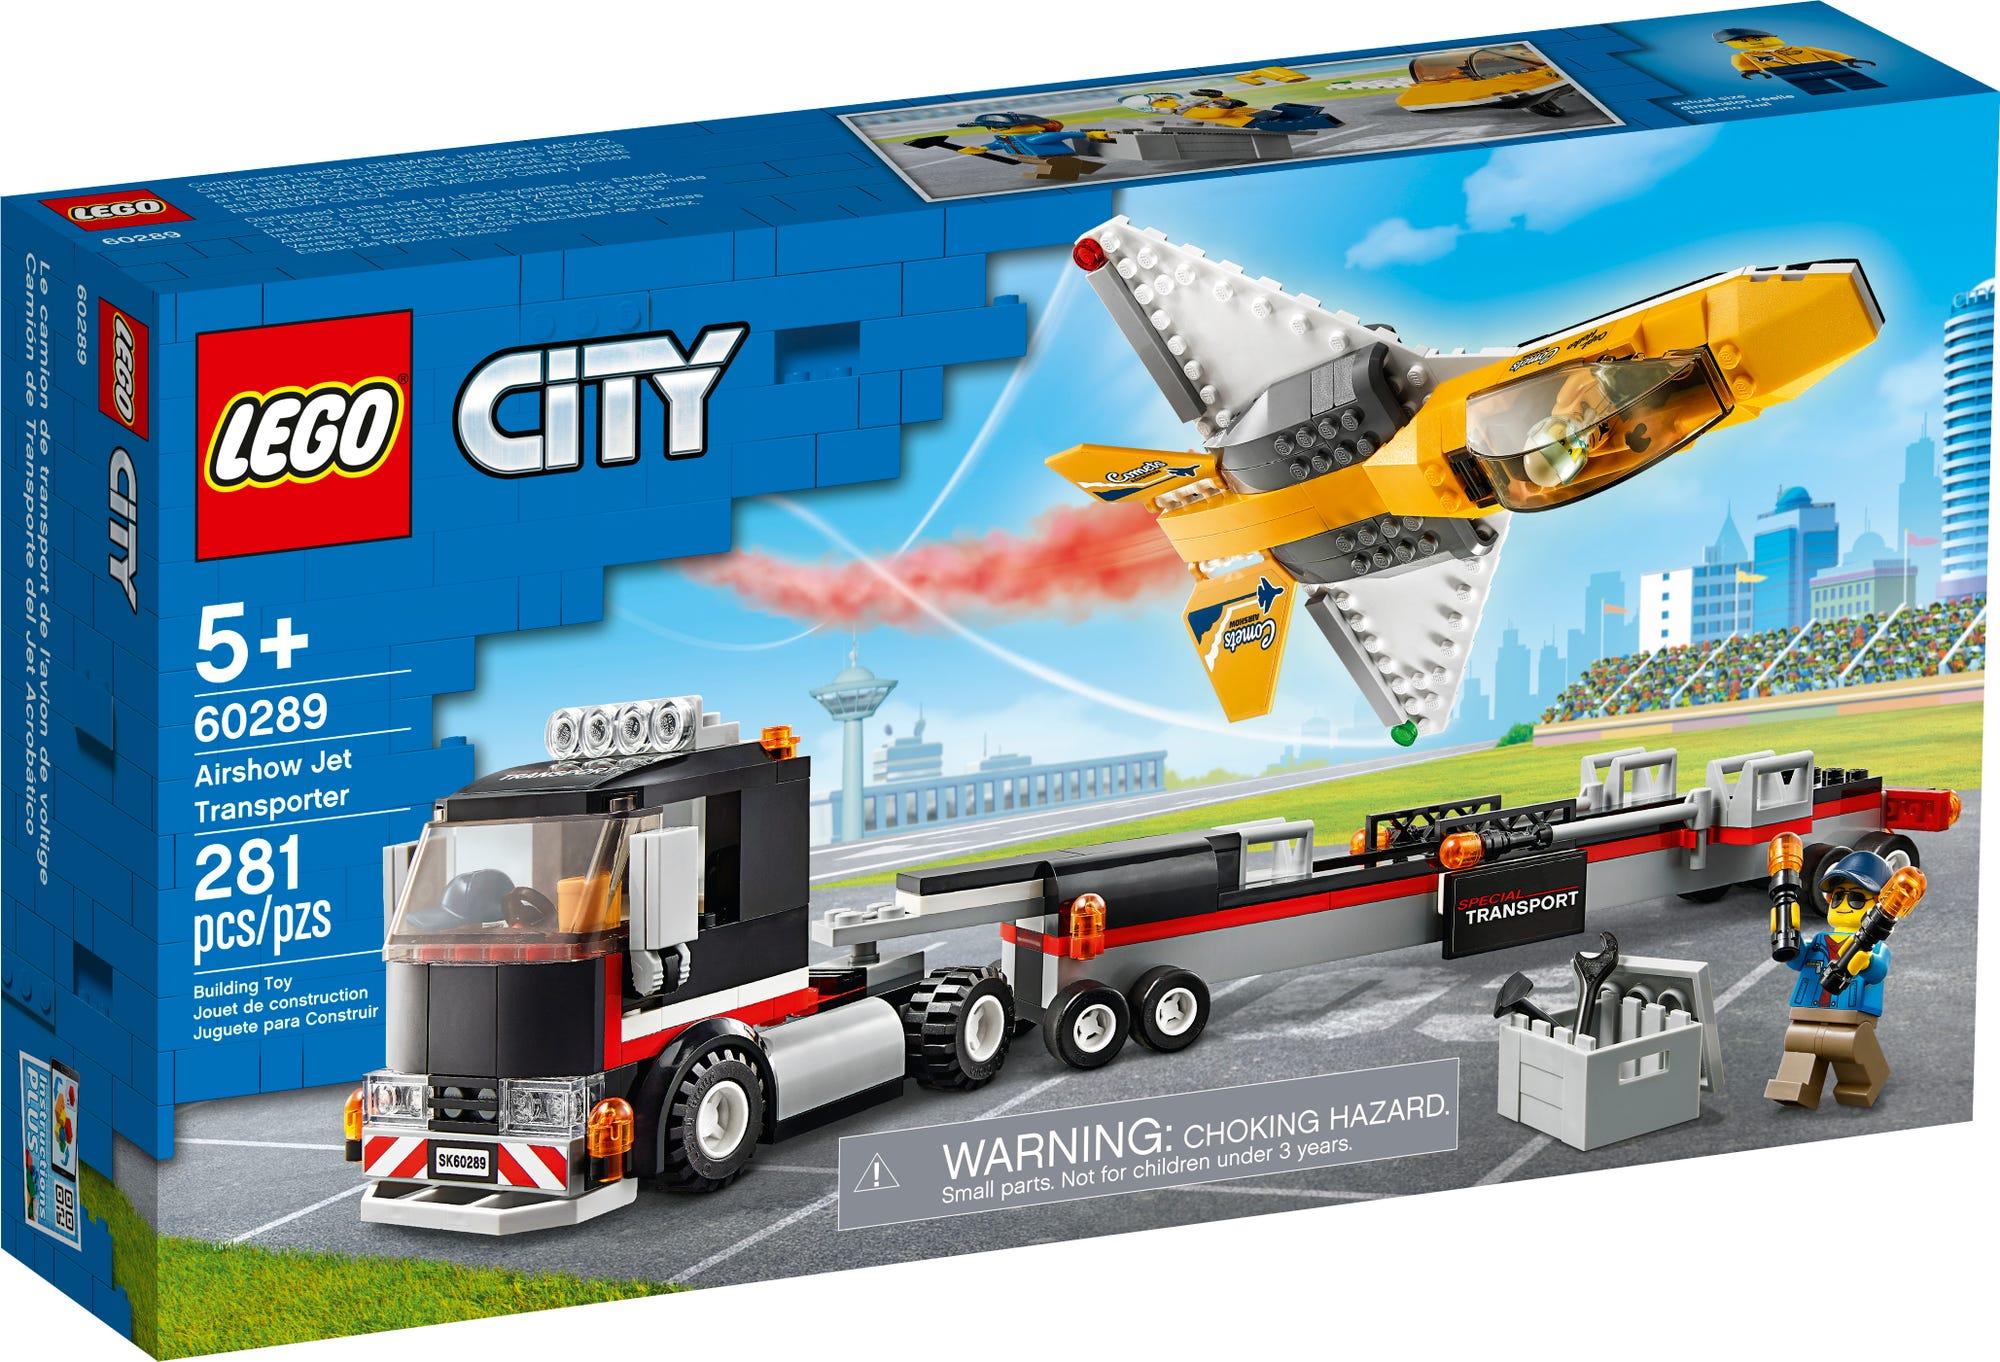 LEGO City 60289 Flugshow Jet Transporter (2)